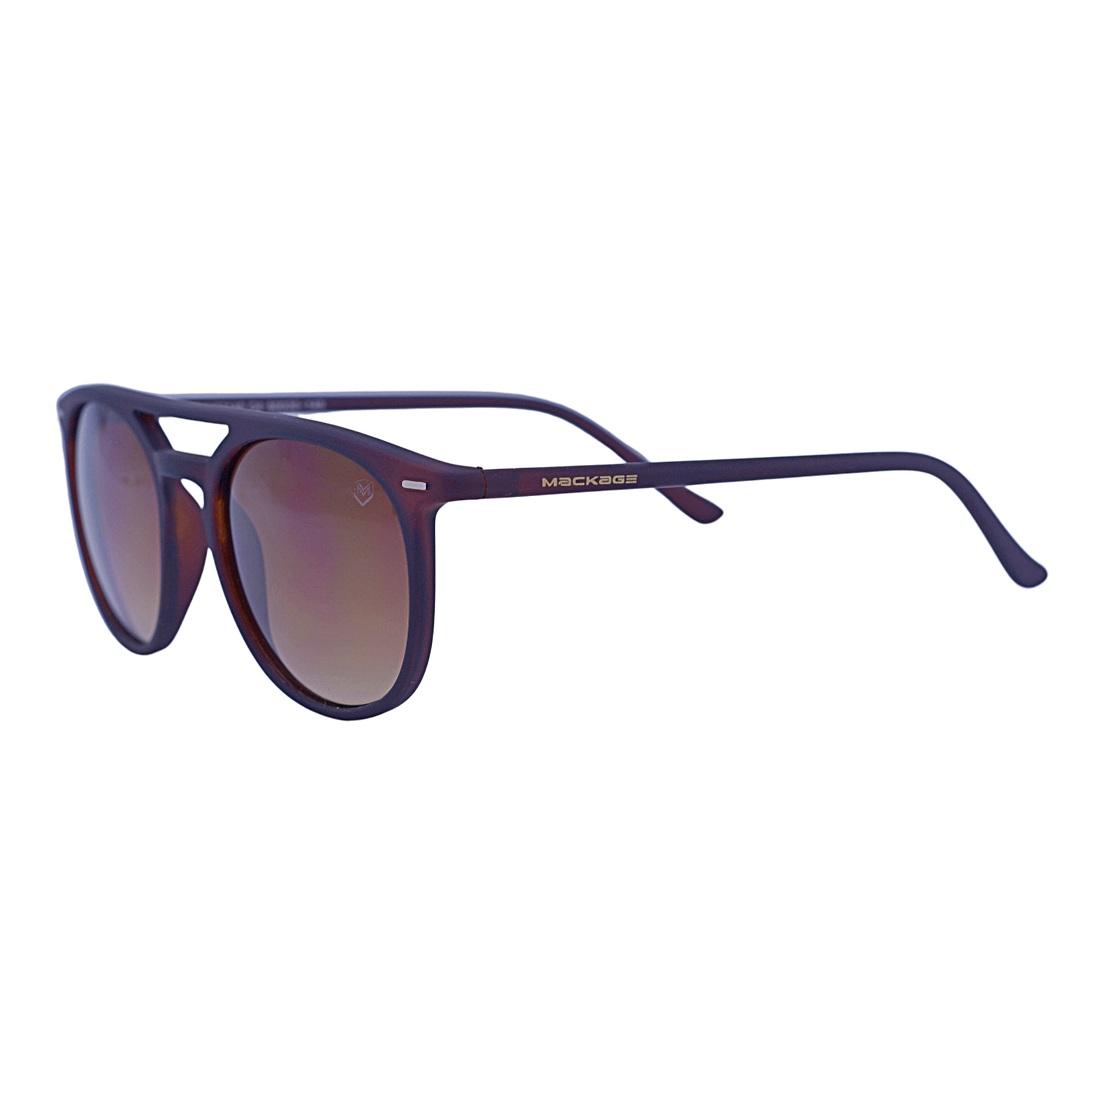 Óculos De Sol Mackage Masculino Acetato Retangular - Marrom Fosco